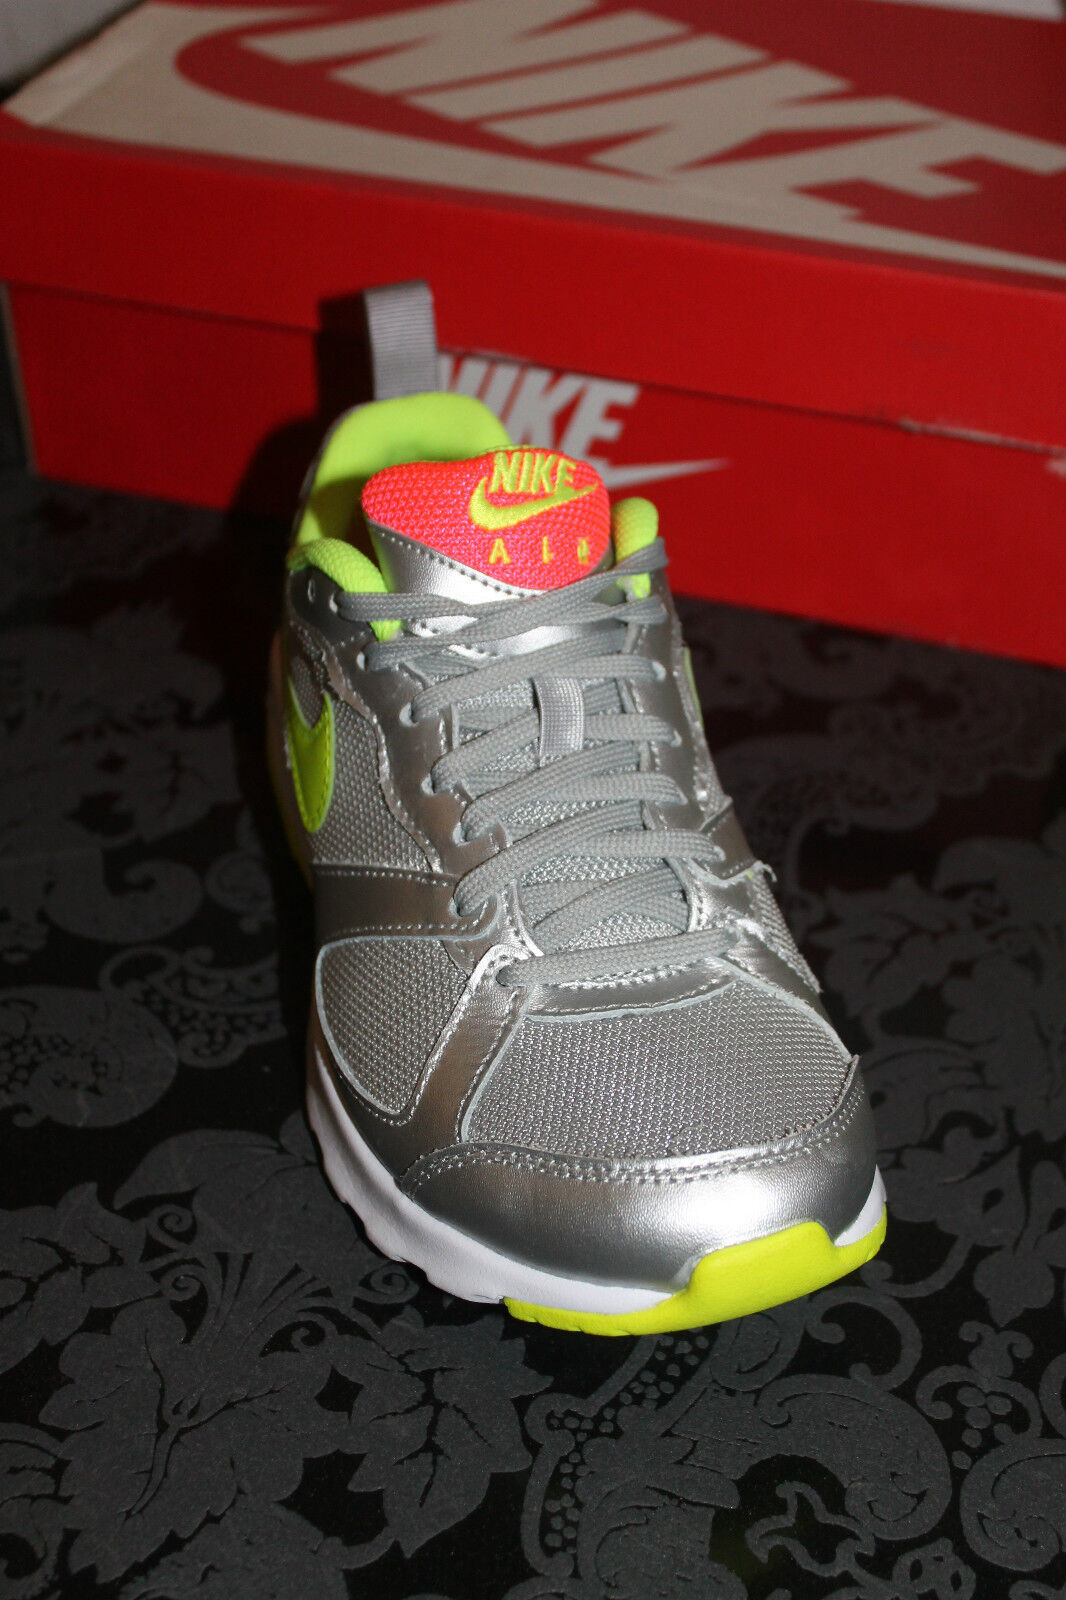 Nike Air Schuhe Max Muse Damen Running Schuhe Air Silber Gelb alle Größen Neu mit Karton 6b1958